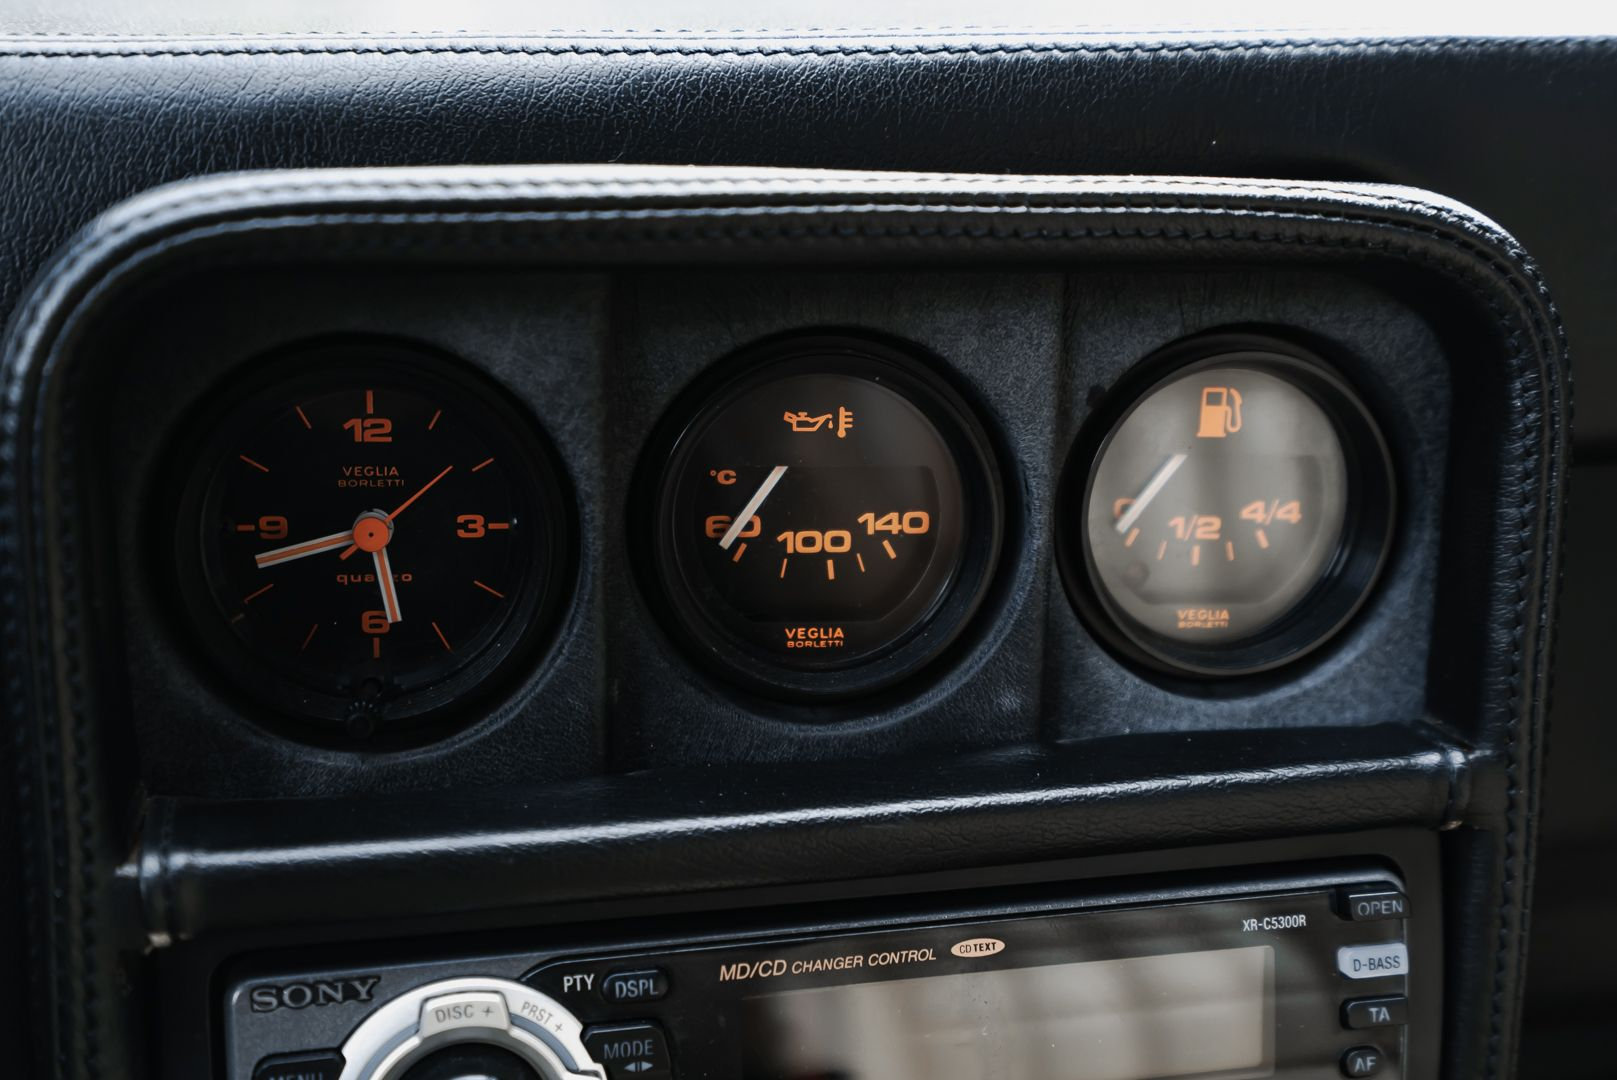 1988 FERRARI 208 GTS TURBO INTERCOOLER 75393